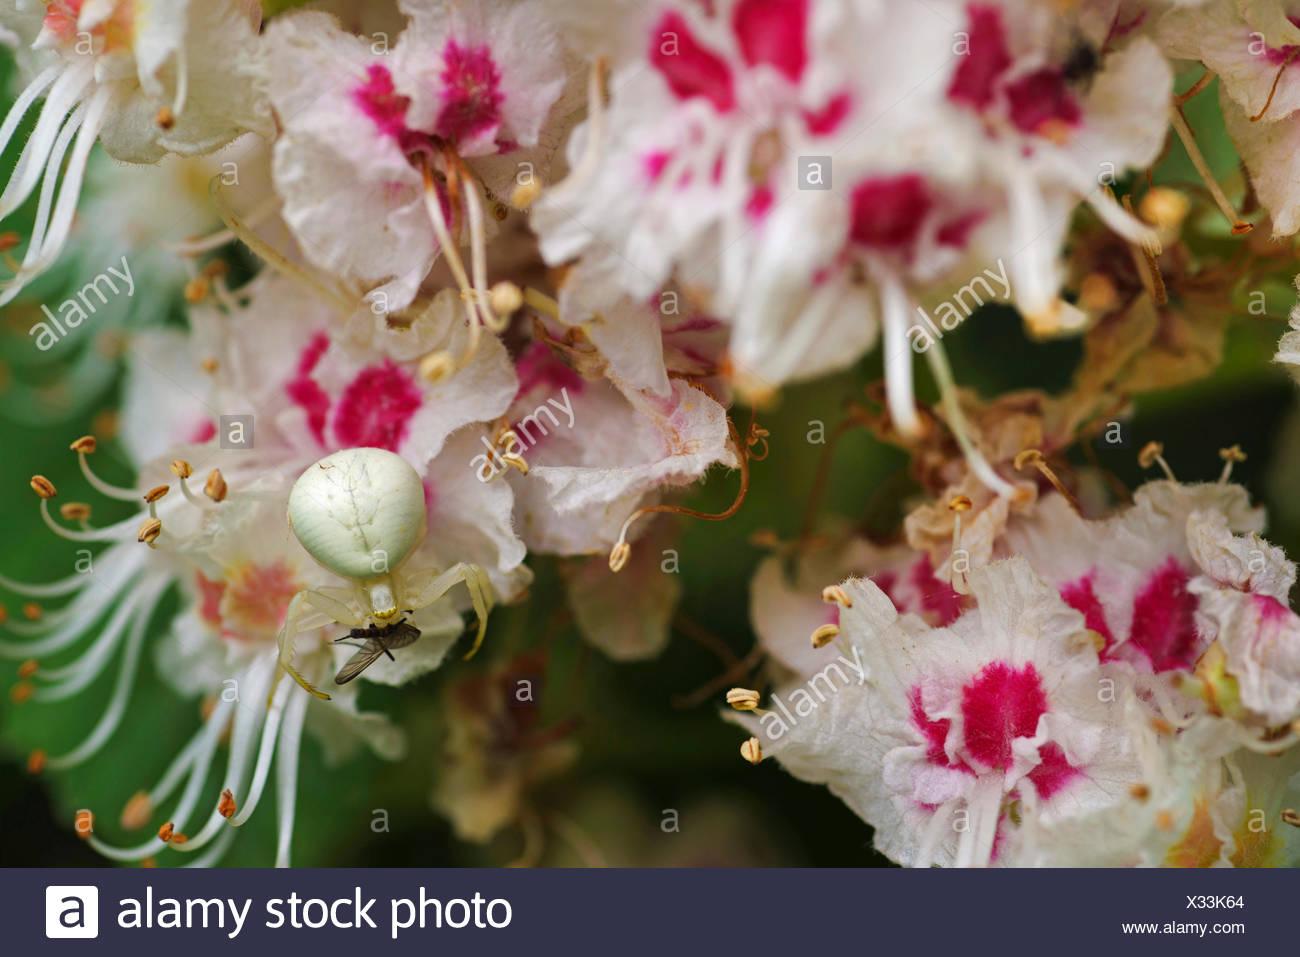 Pink buckeye horse chestnut tree stock photos pink buckeye horse common horse chestnut aesculus hippocastanum crab spider on chestnut flowers germany mightylinksfo Gallery